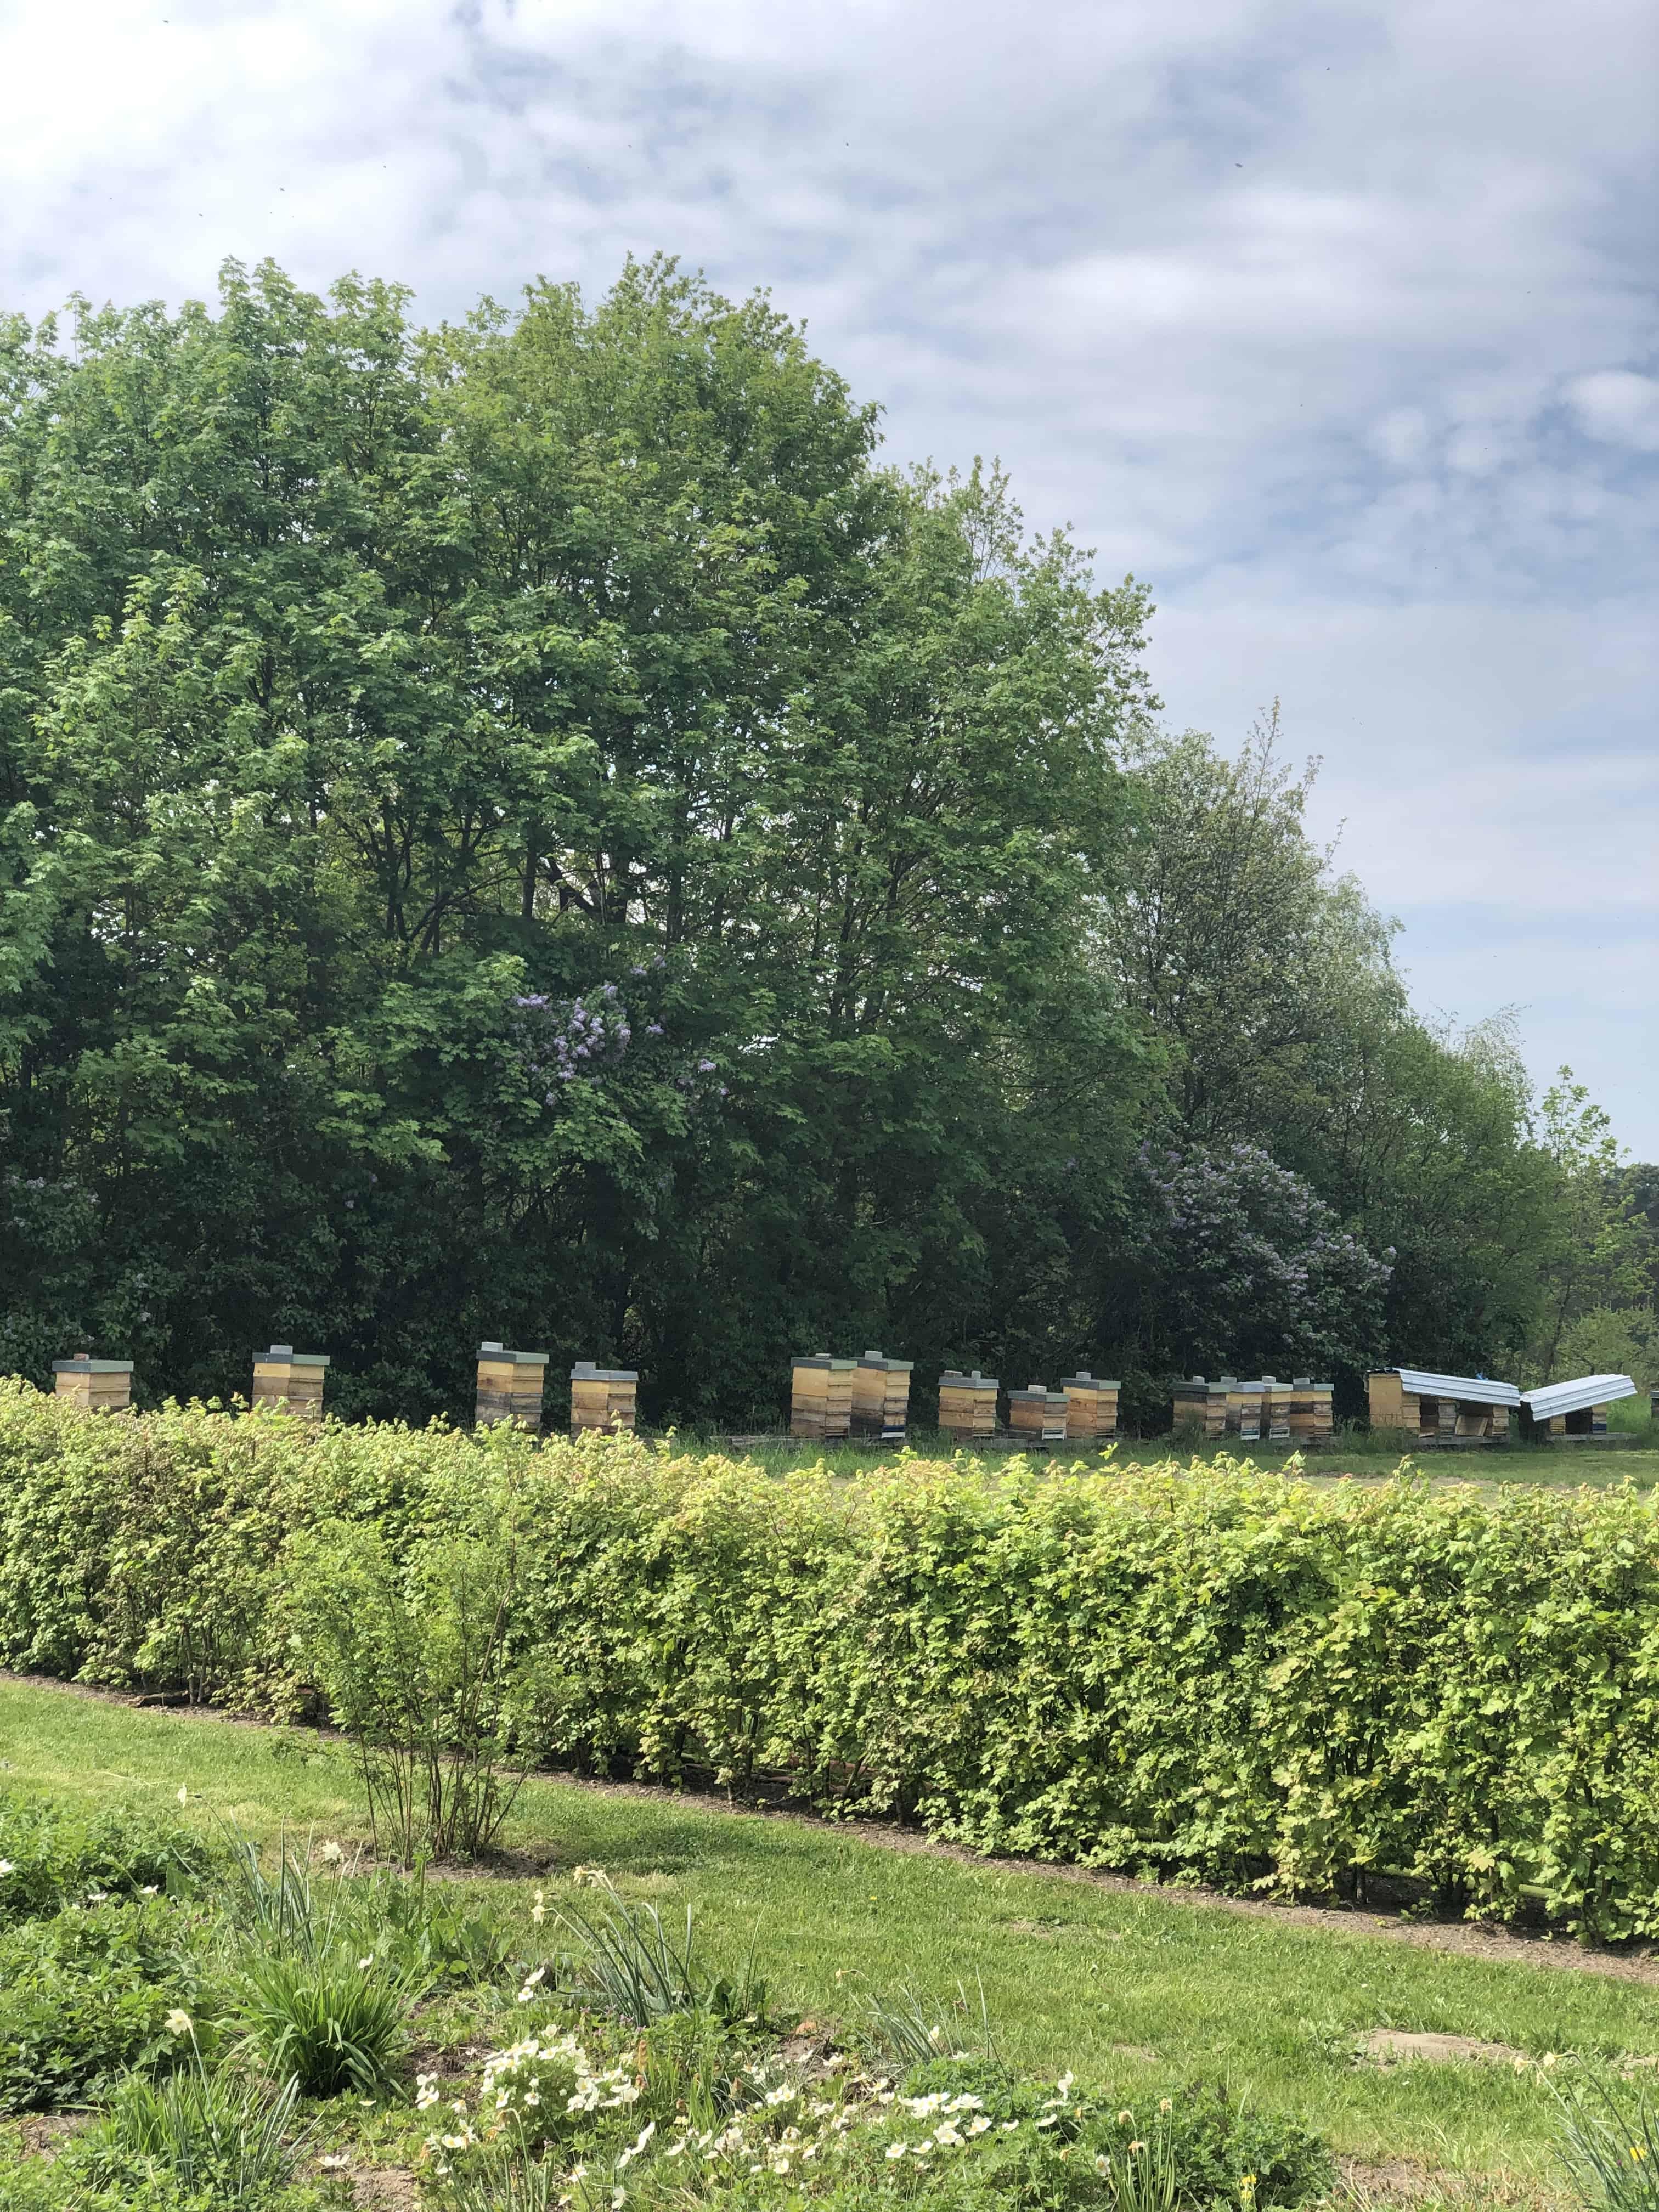 Botanischer Garten Italien Gardasee: Bienenhäuser Botanischer Garten Berlin Pankow